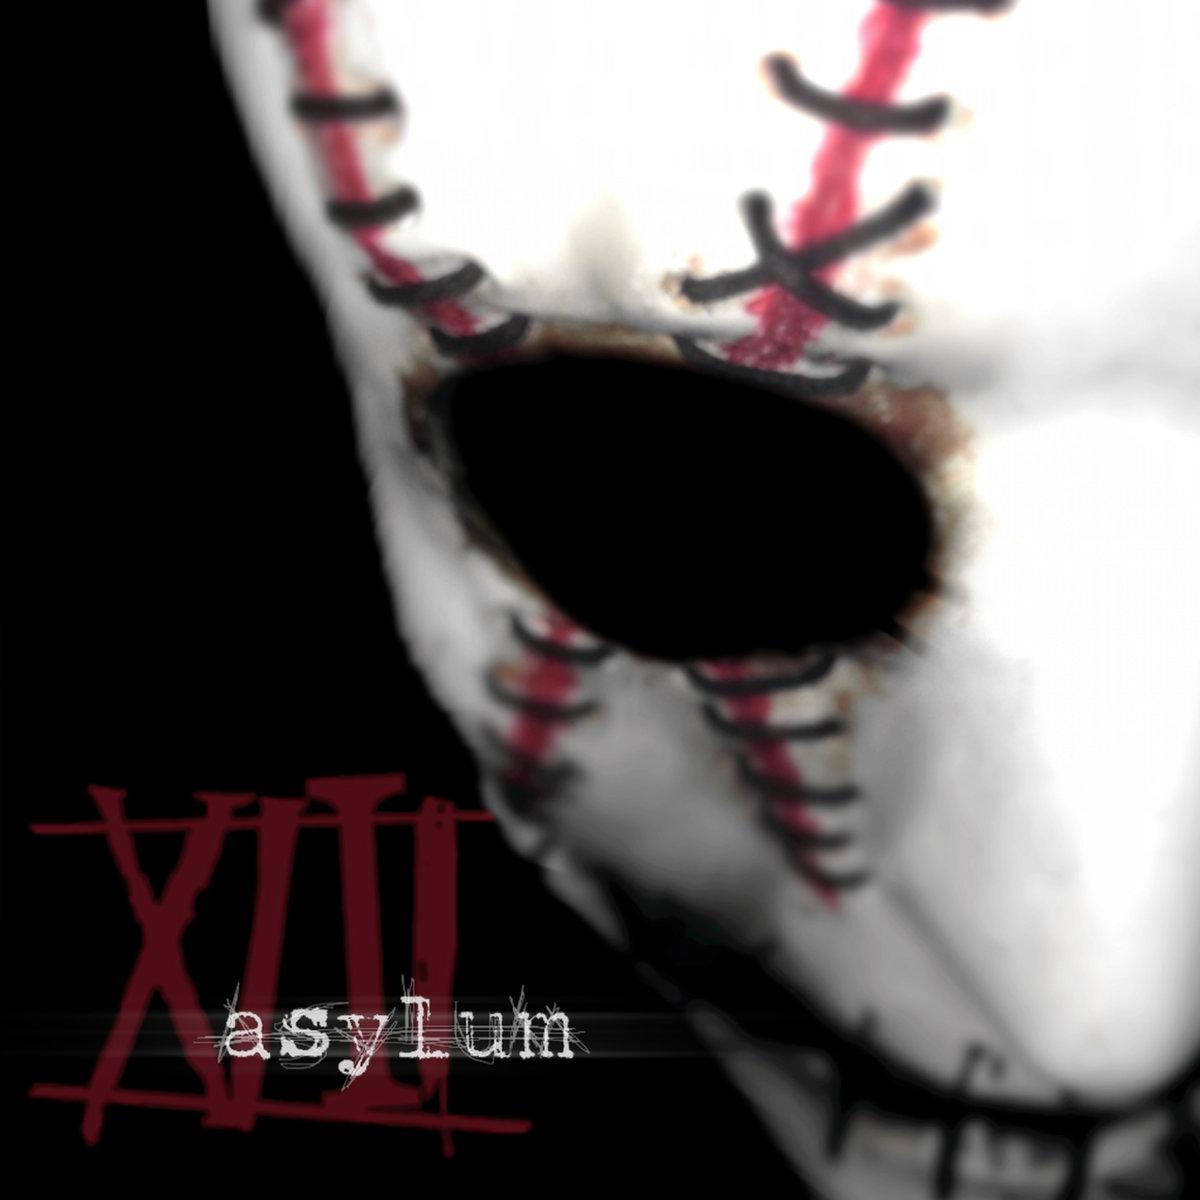 XIII - Asylum -